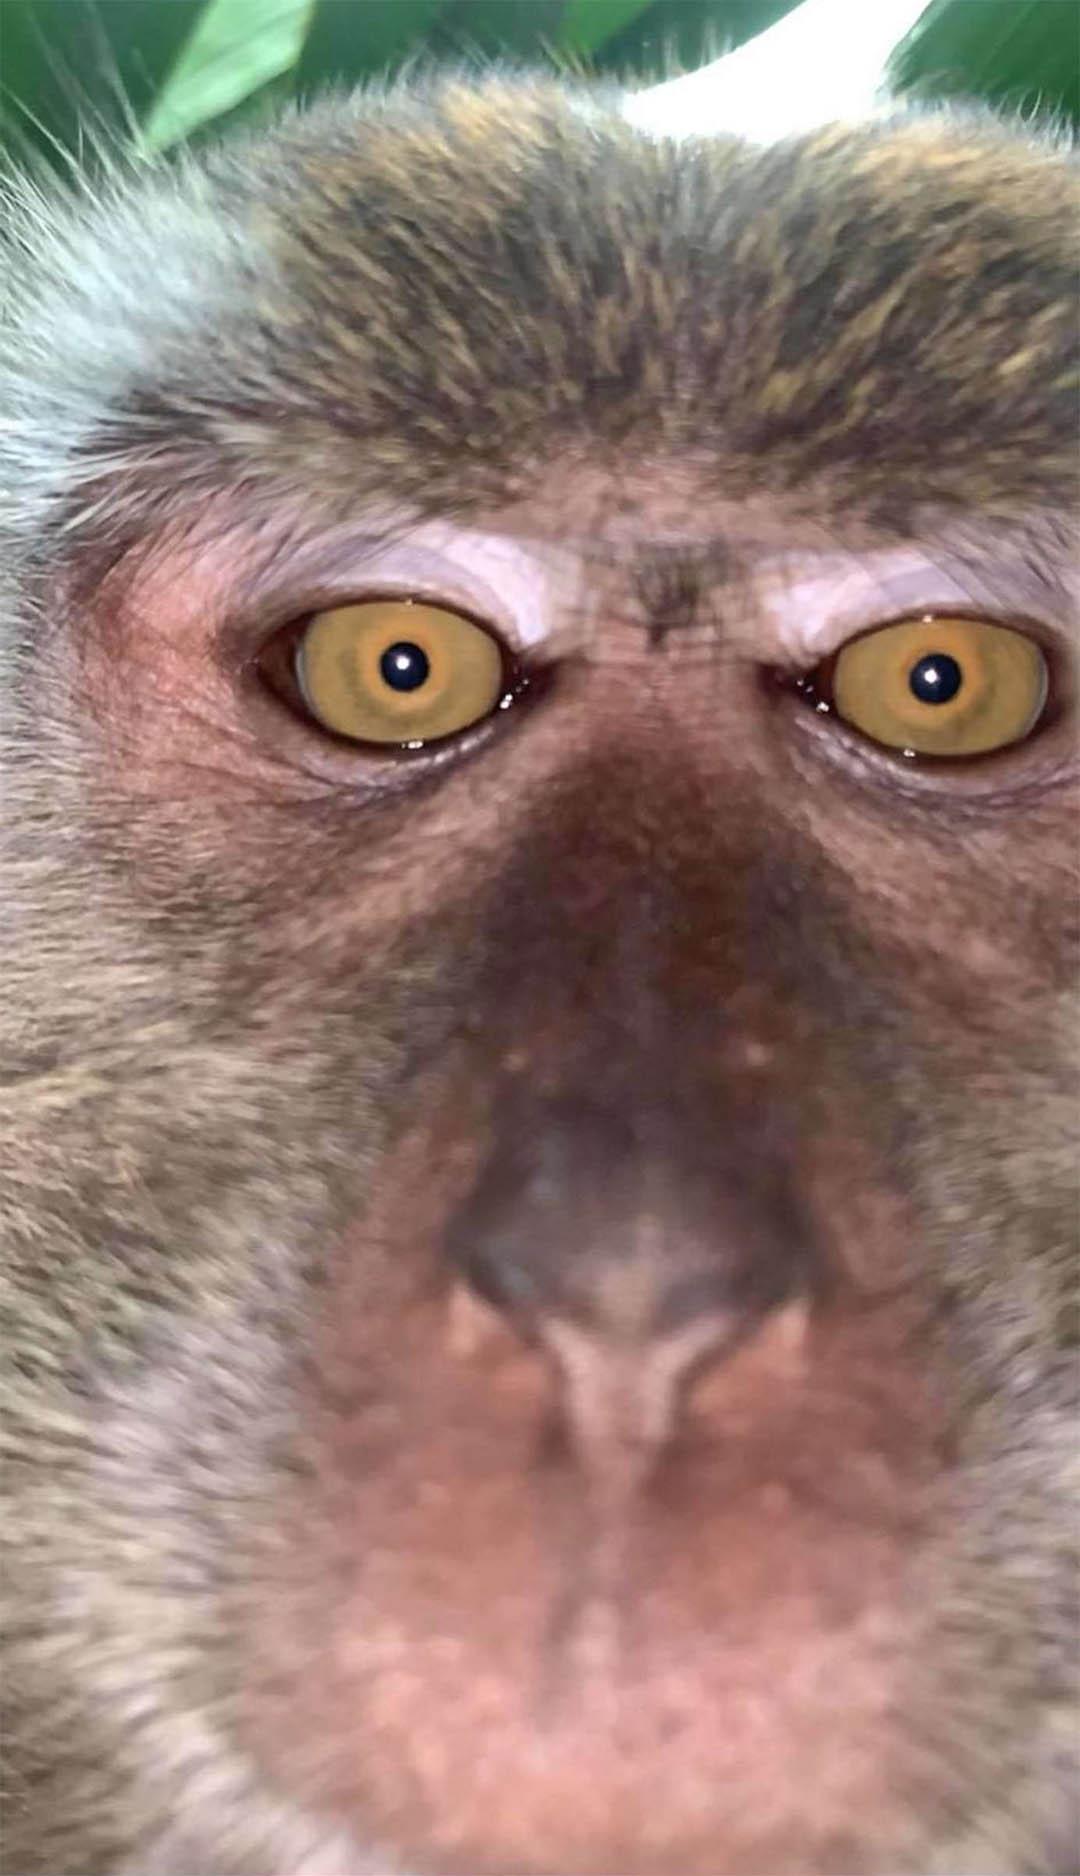 Mono roba teléfono